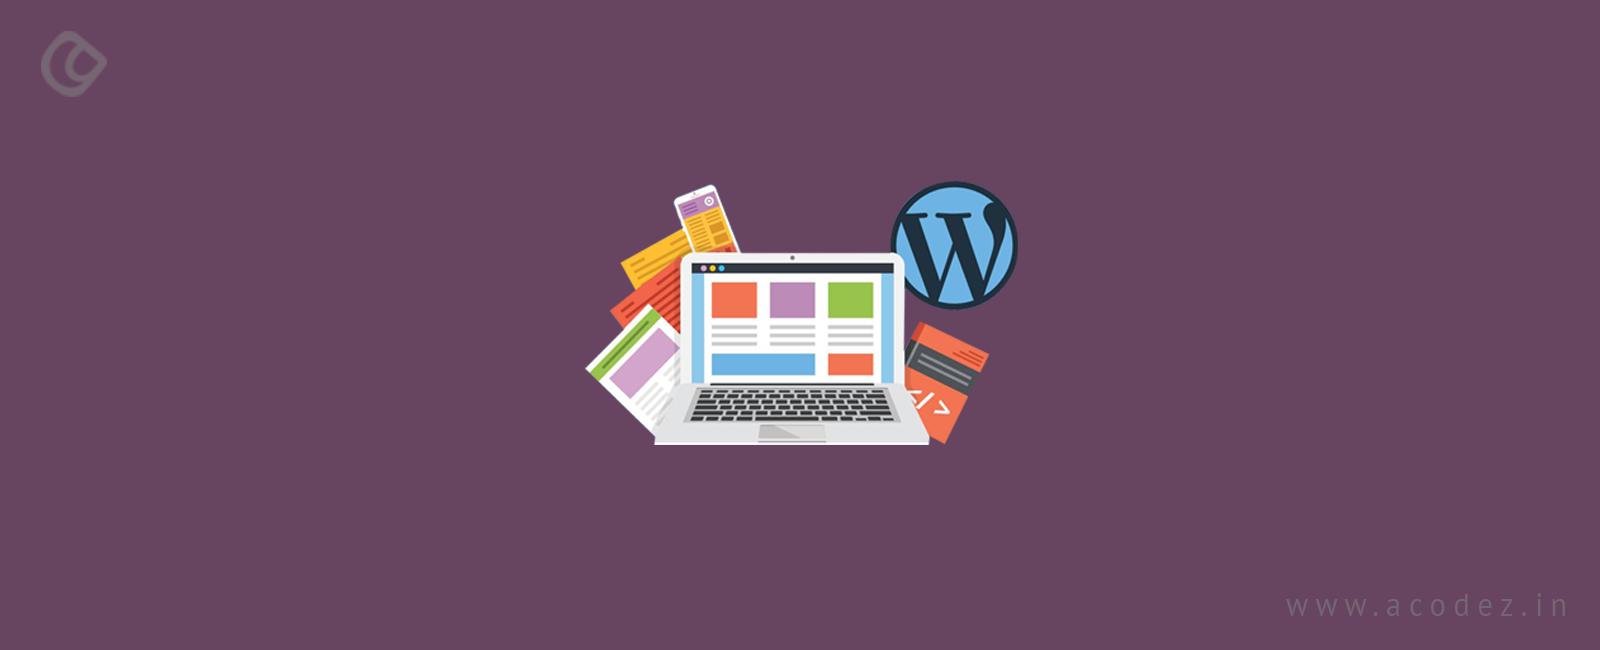 6bffa7c2209 Benefits of Virtual Reality in WordPress Design and Development